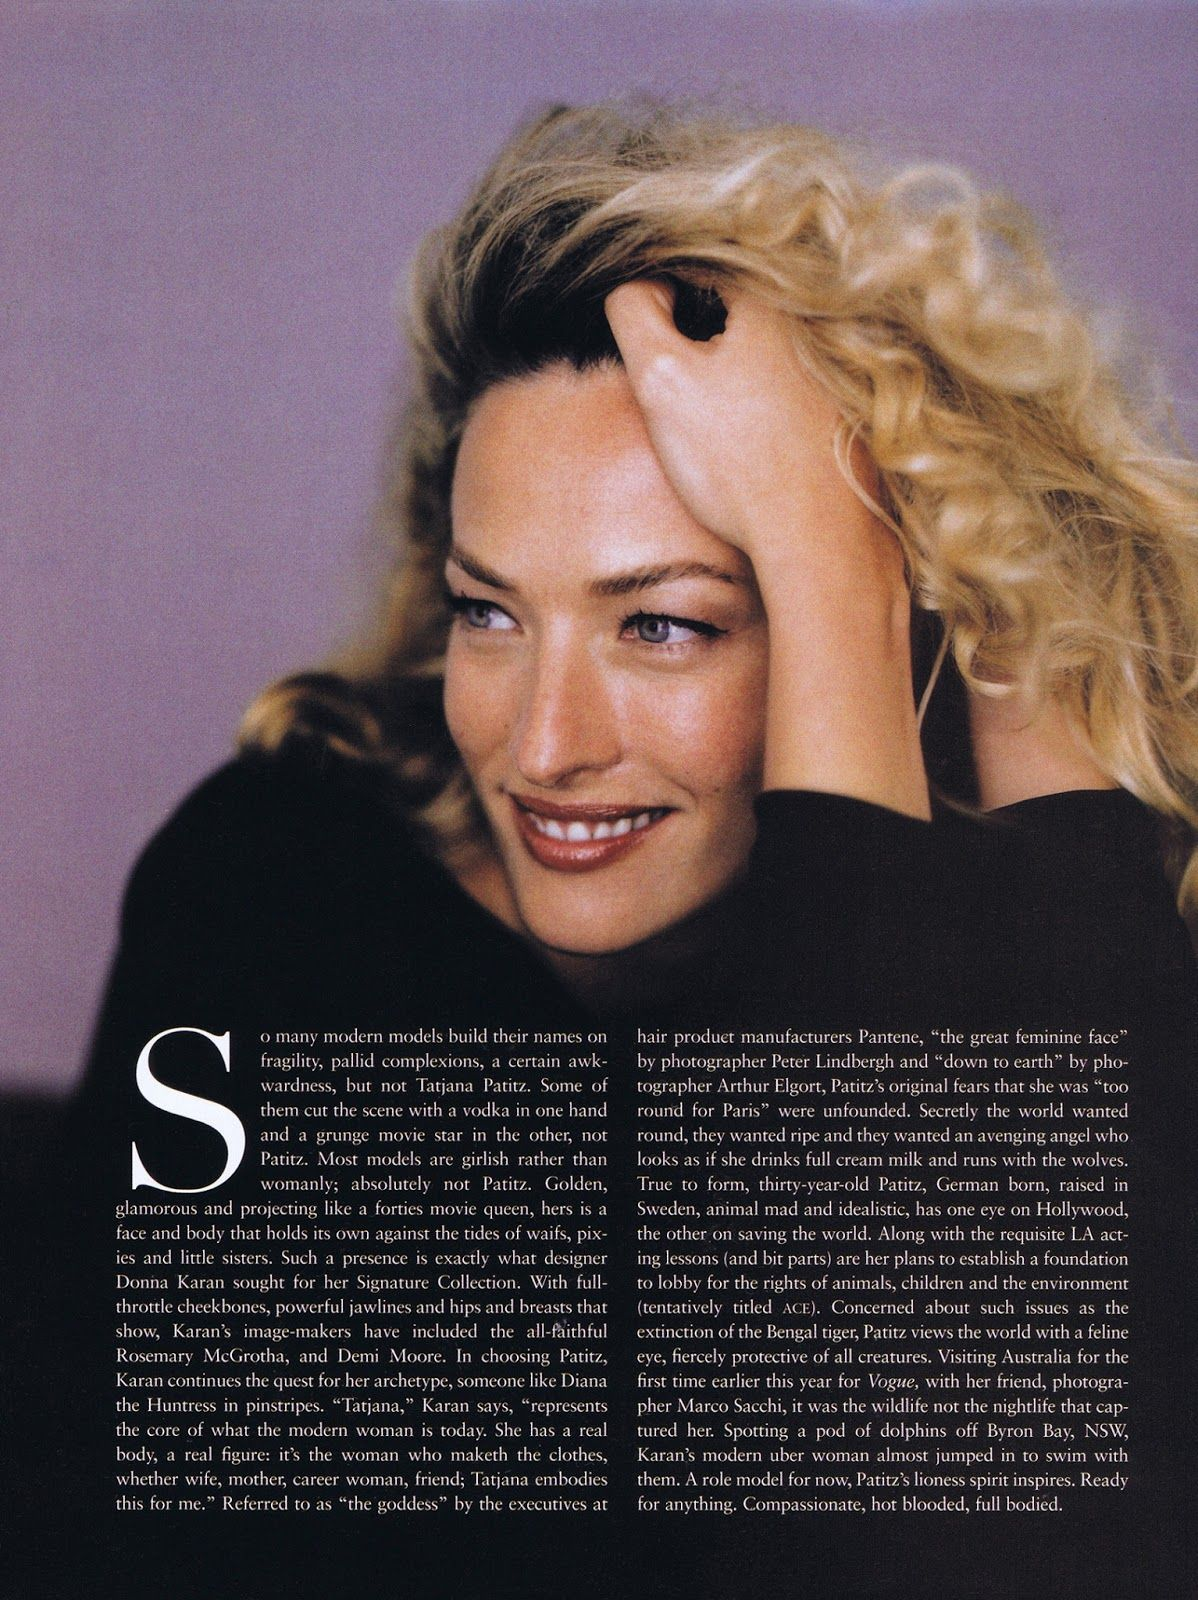 Tatjana Patitz by Marco Sacchi for Vogue Australia, May 1997